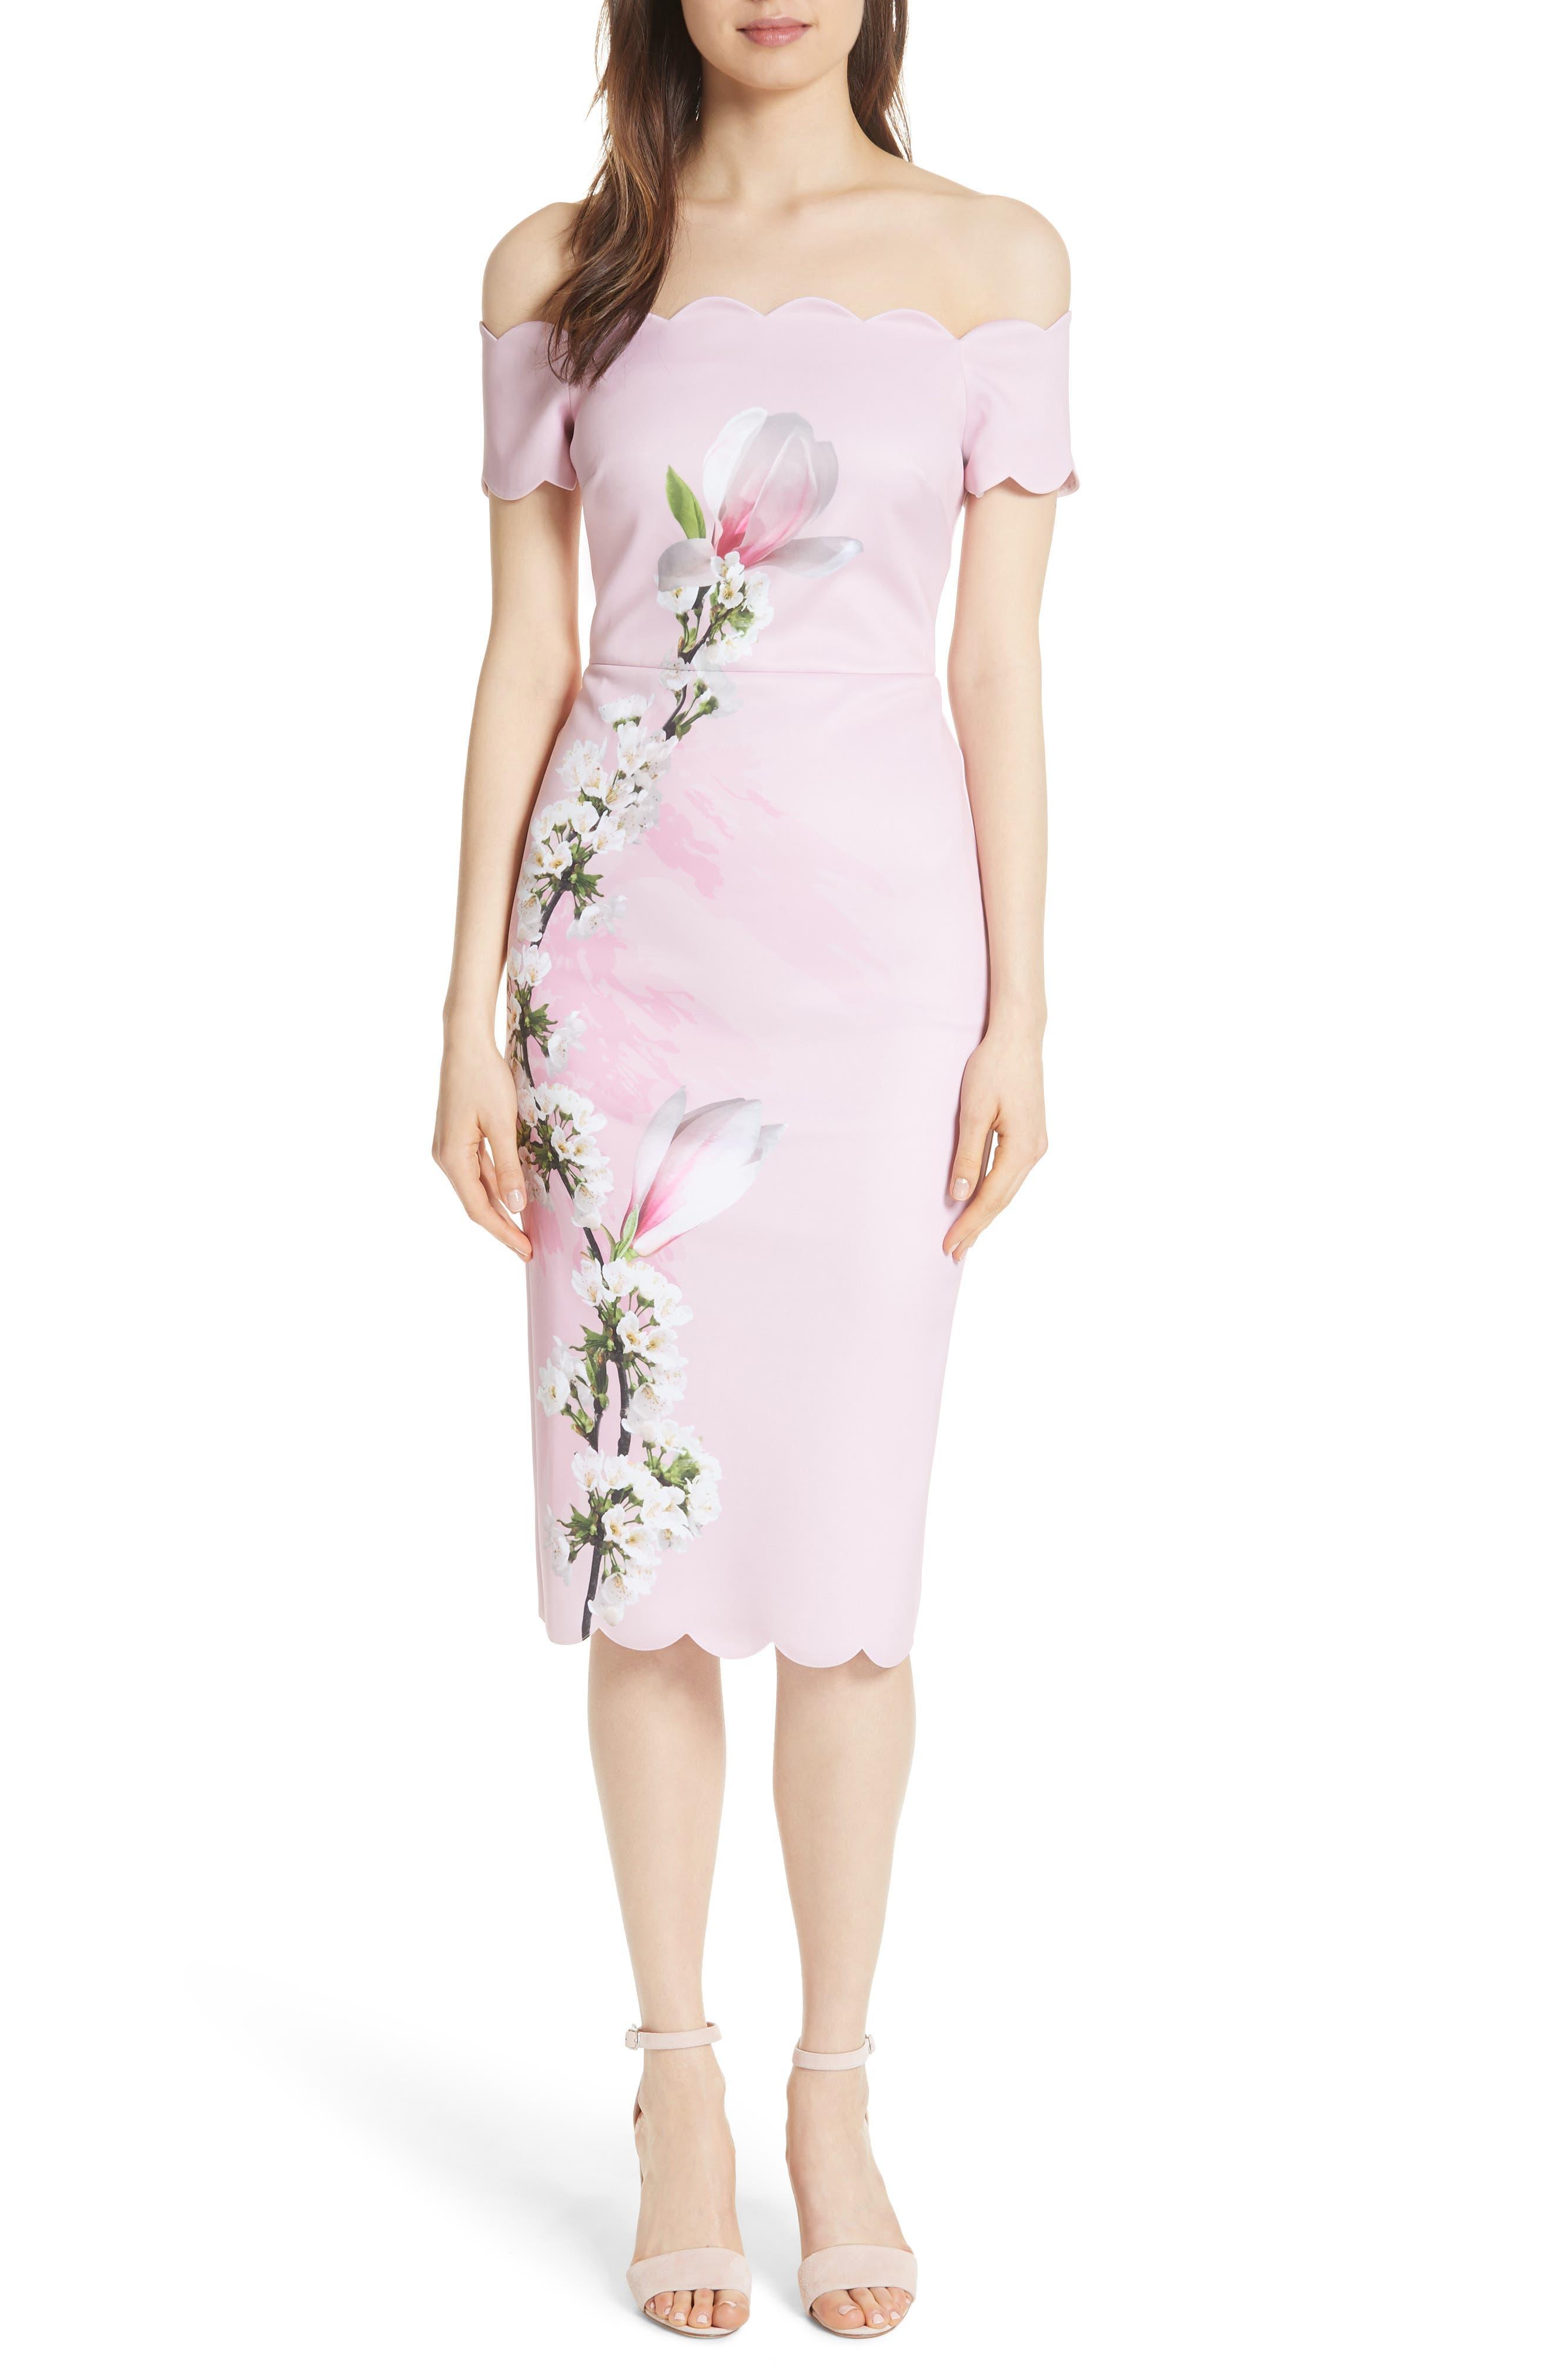 Olyva Harmony Body-Con Dress,                         Main,                         color, PALE PINK